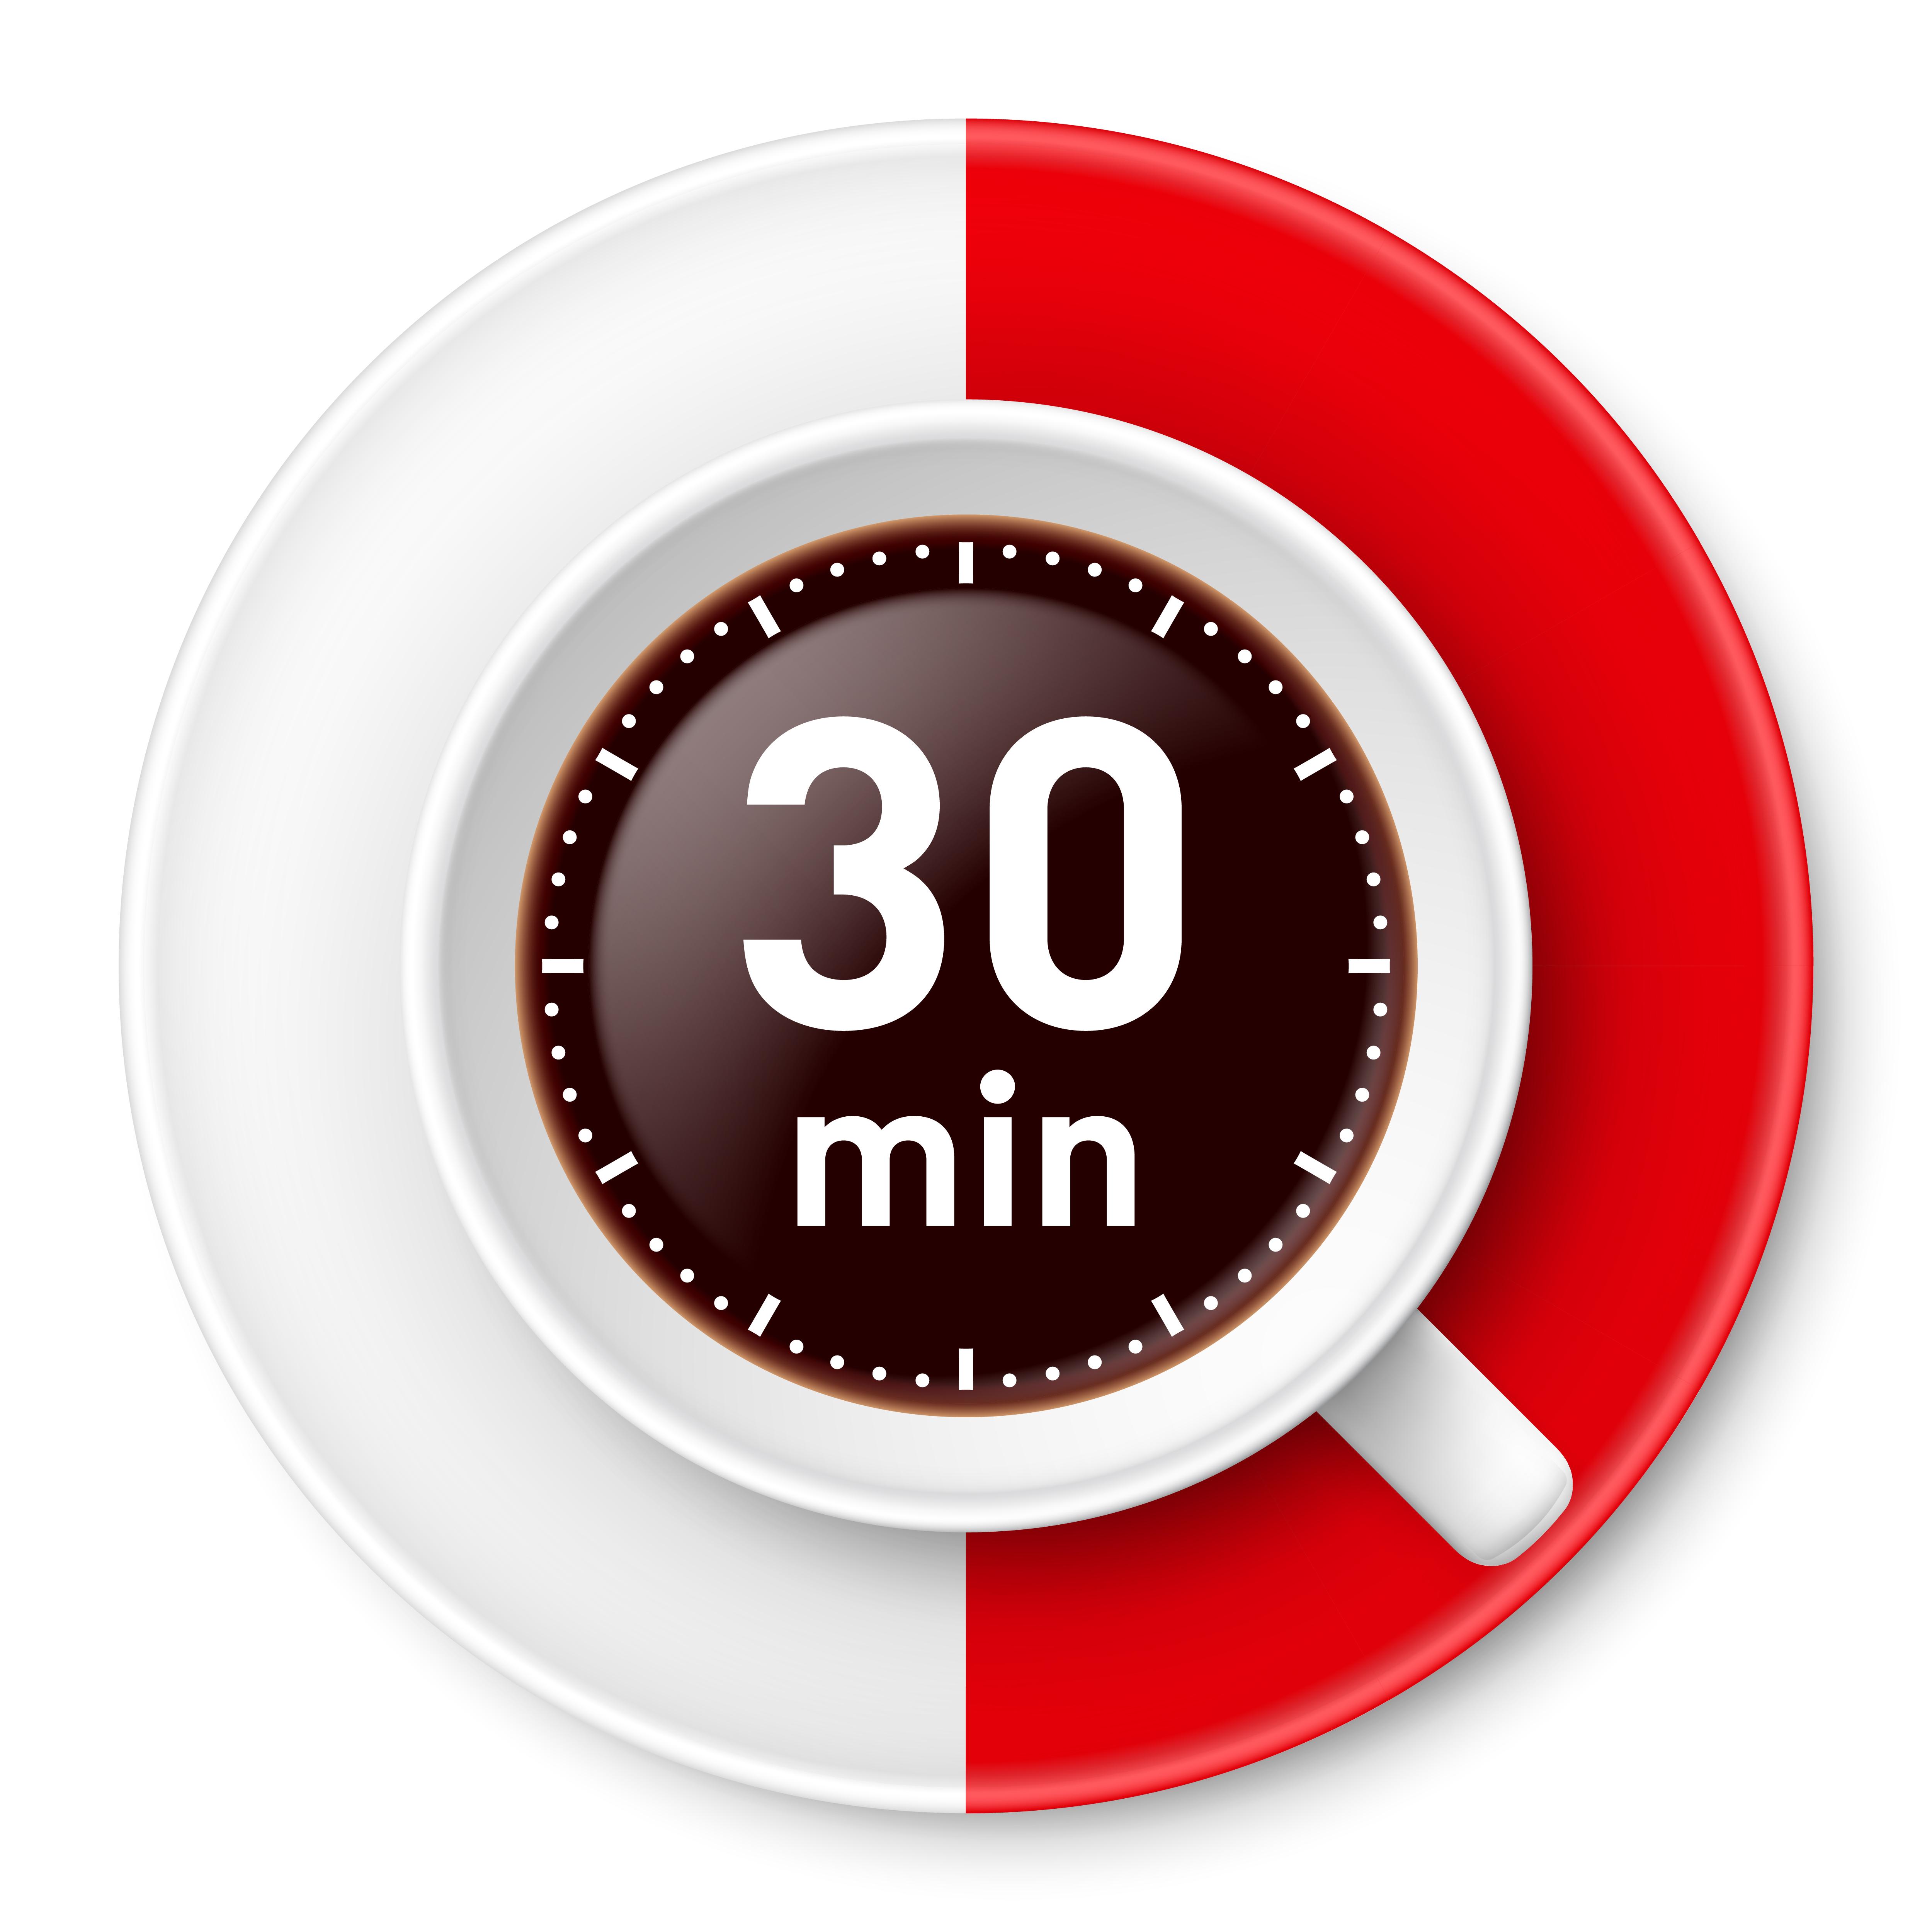 shutterstock-meia-hora-pomodoro